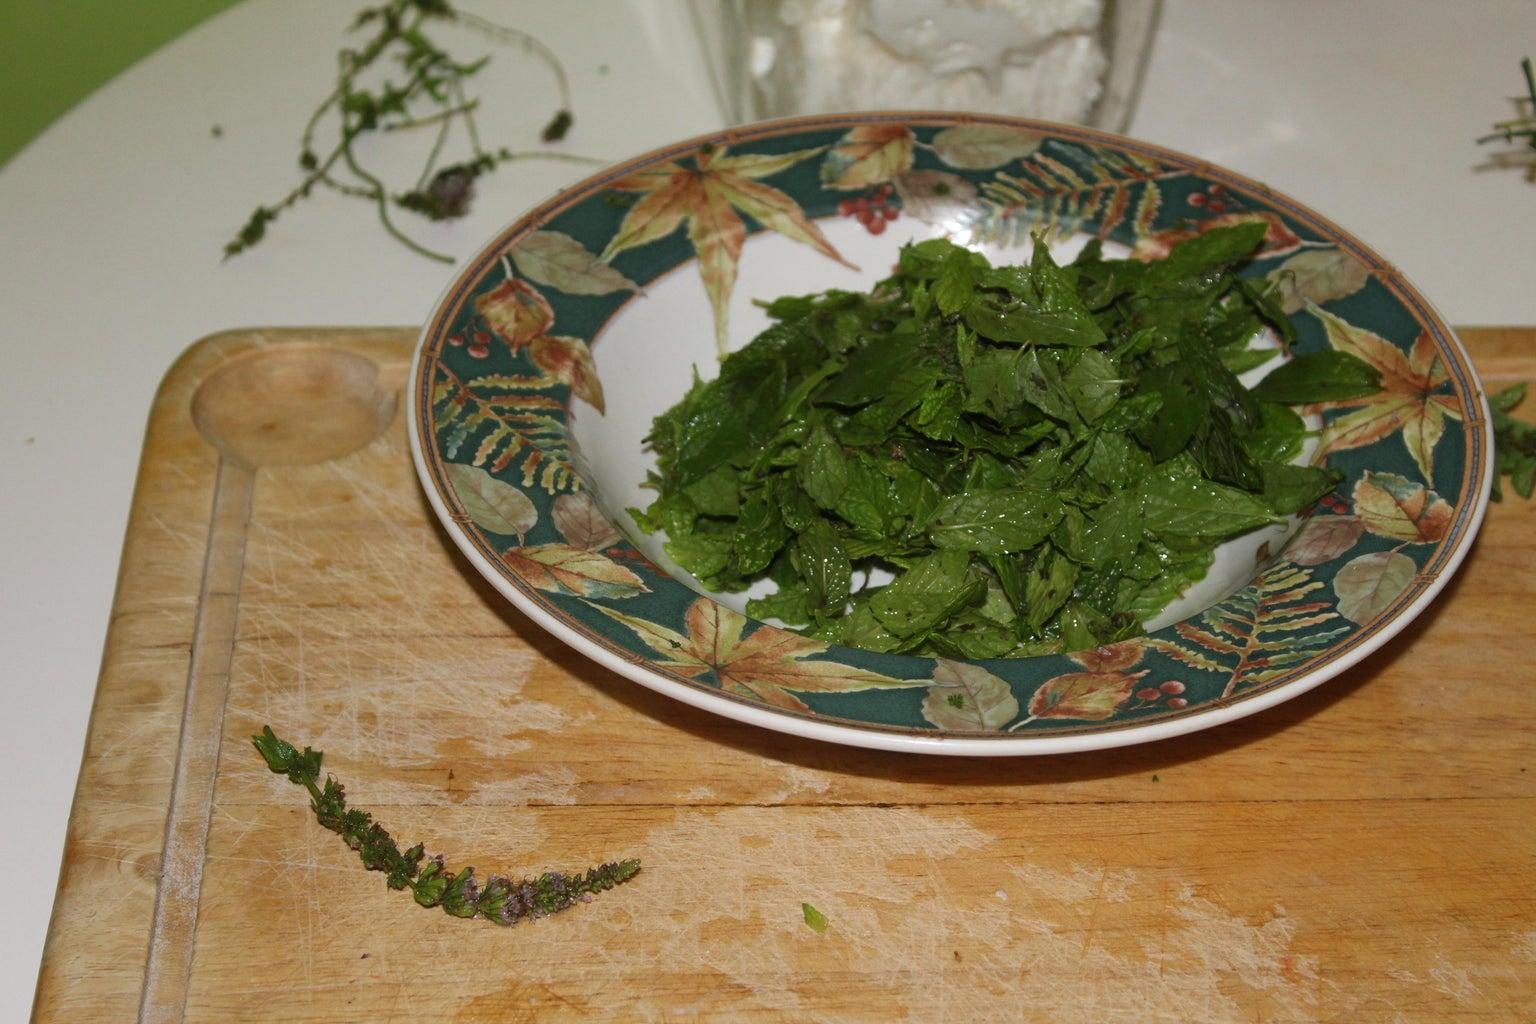 Prepare the Herbs